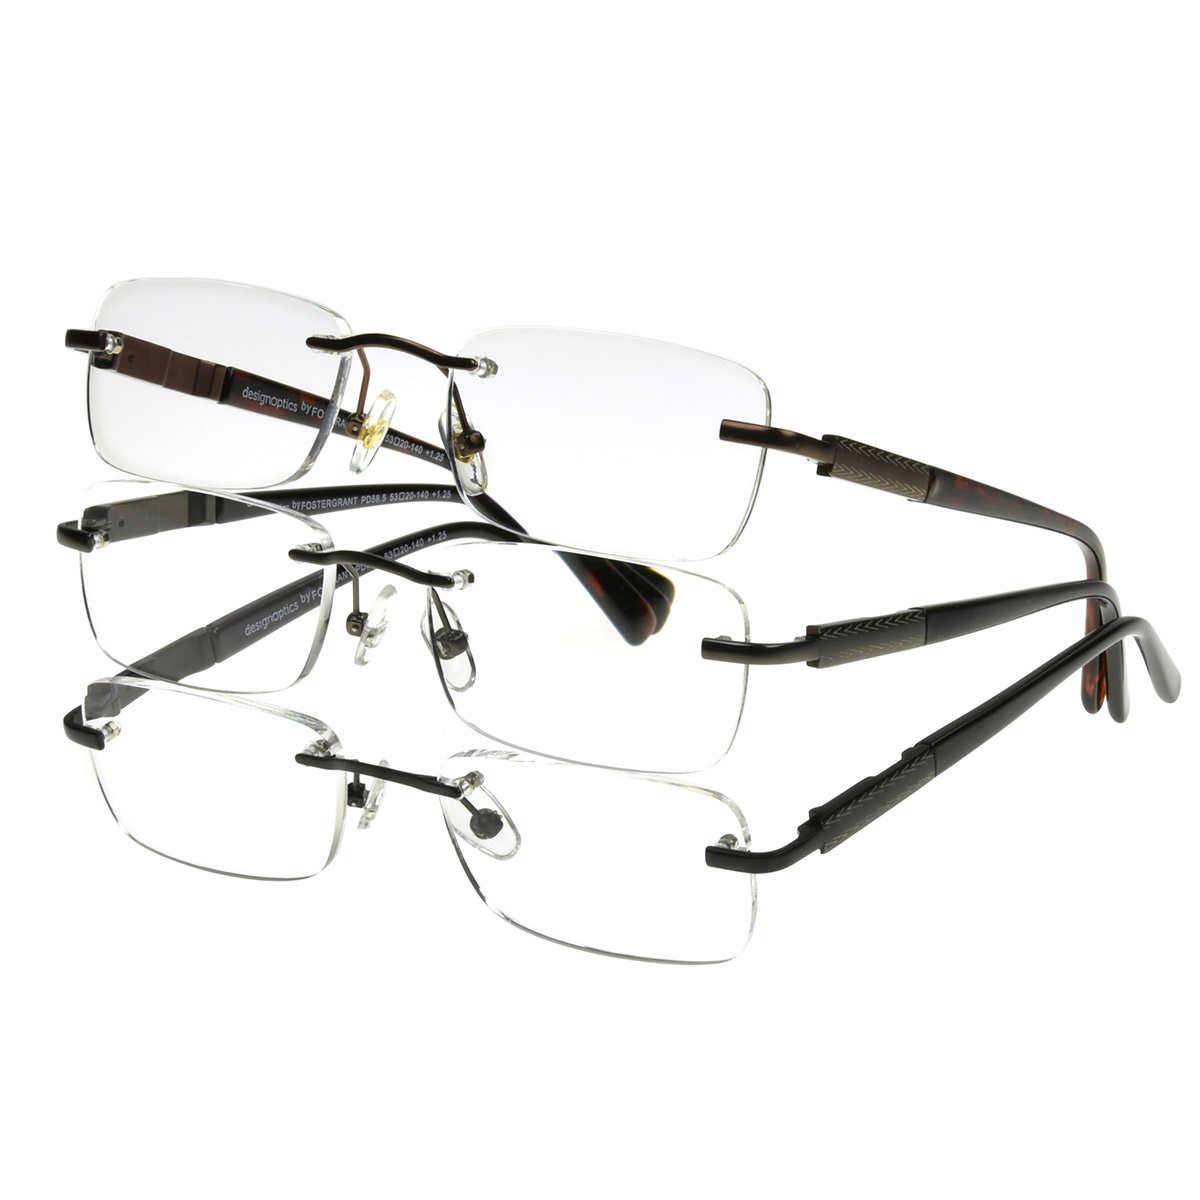 Design Optics By Foster Grant Ladies Semi-Rimless 3-pack Reading Glasses